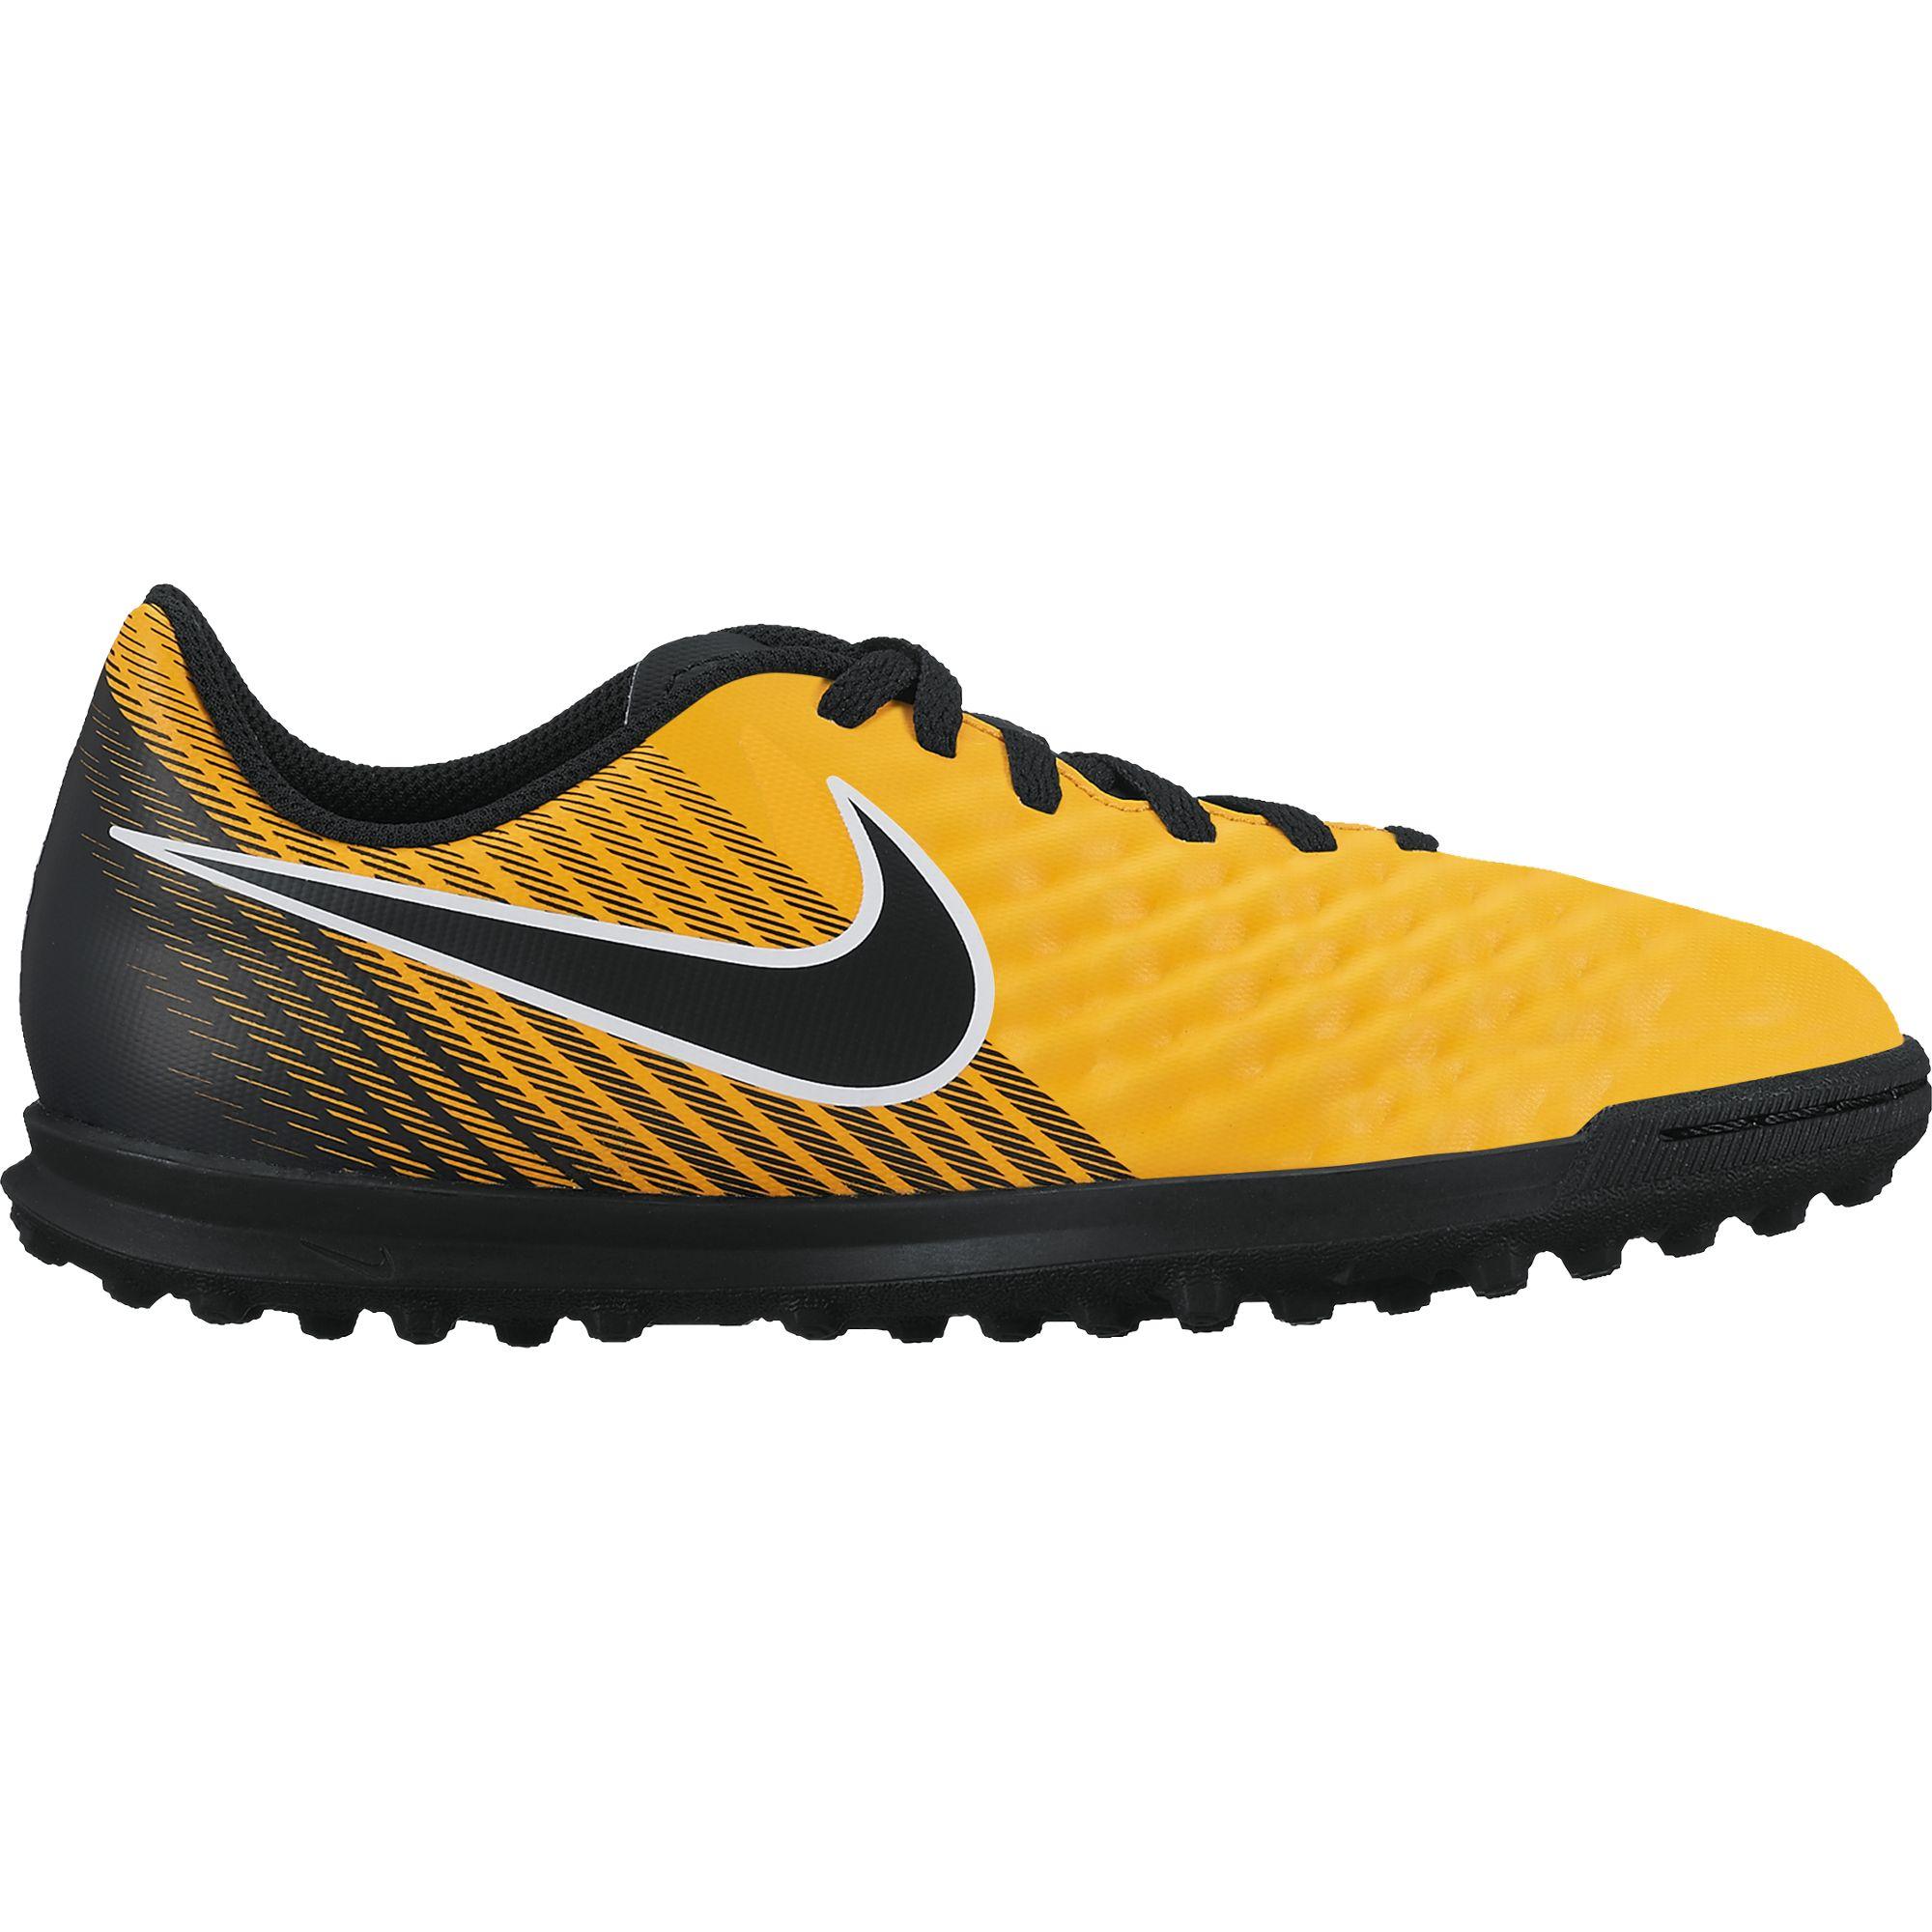 Nike Jr. MagistaX Ola II (TF) voetbalschoen